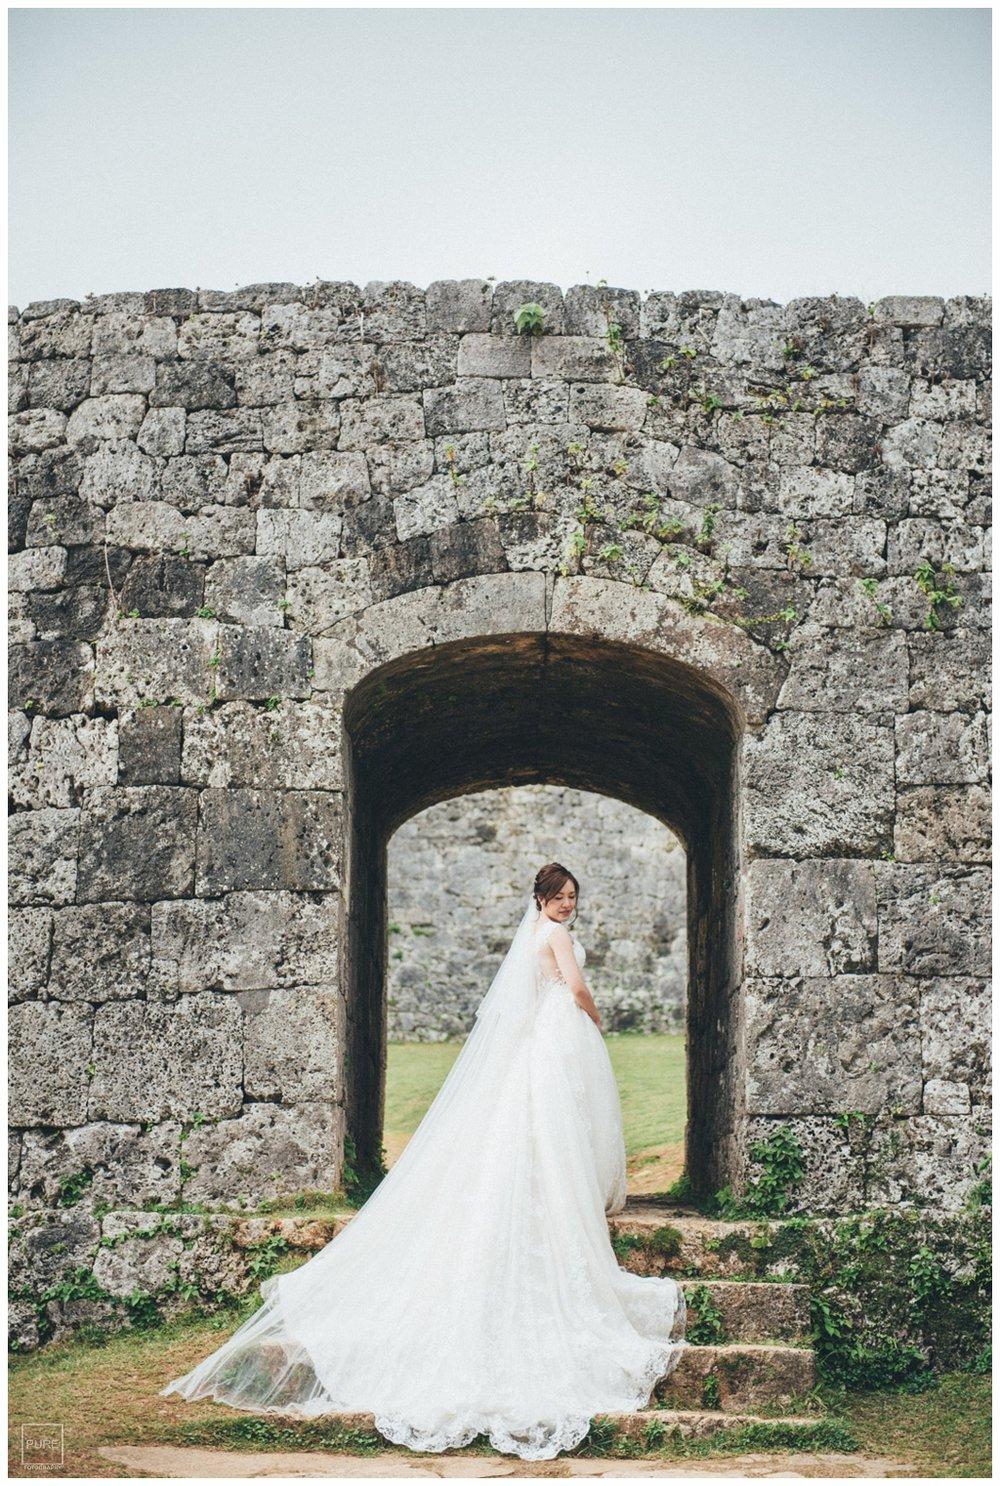 PUREFOTO_海外婚紗攝影Oversea_Prewedding_座喜味城白紗婚紗拍攝